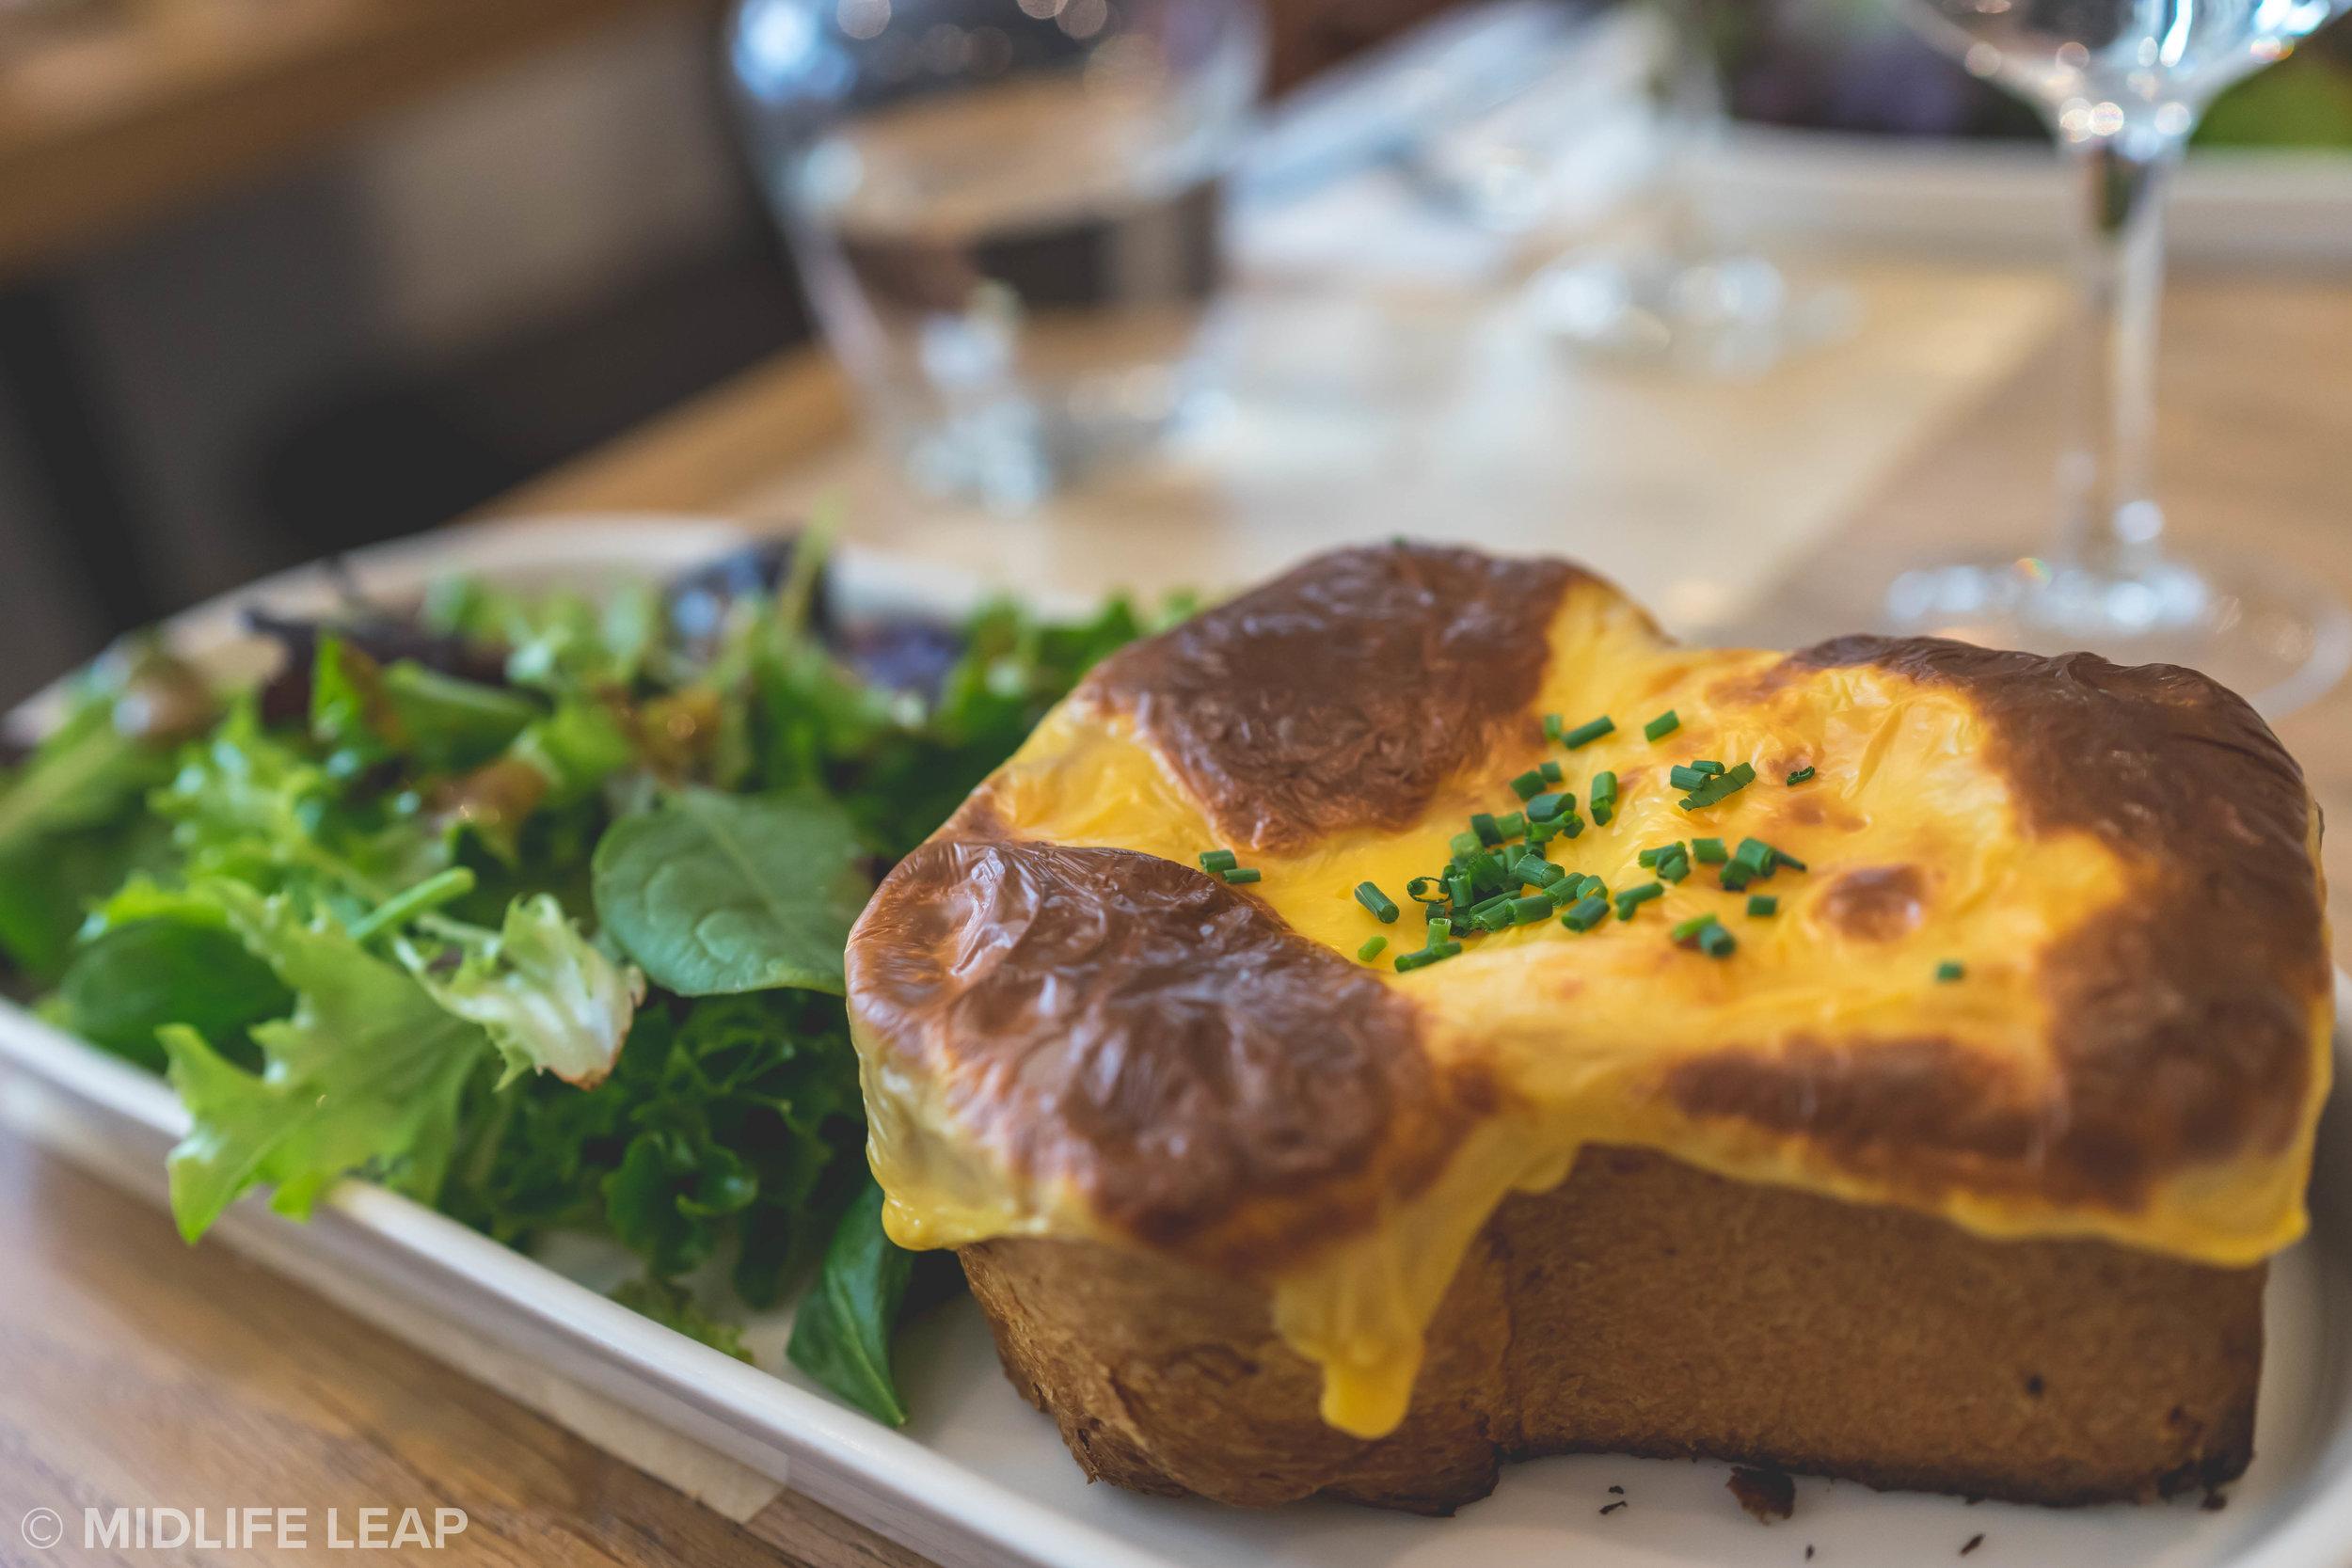 where-to-eat-breakfast-in-saint-germain-paris-comptoir-poilane